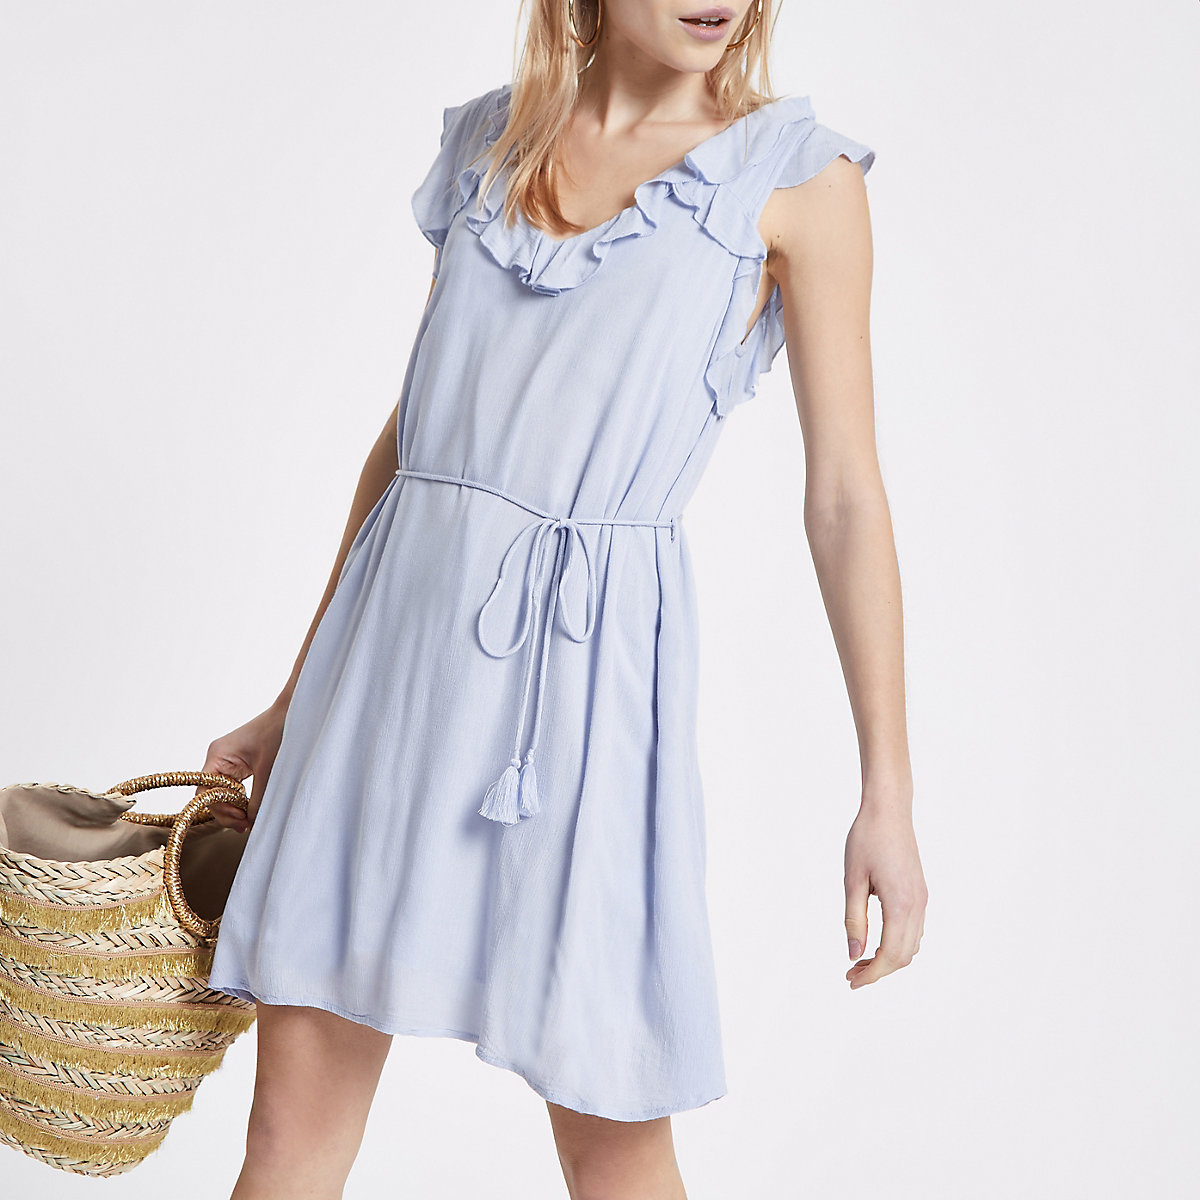 Petite Light blue lace-up frill swing dress